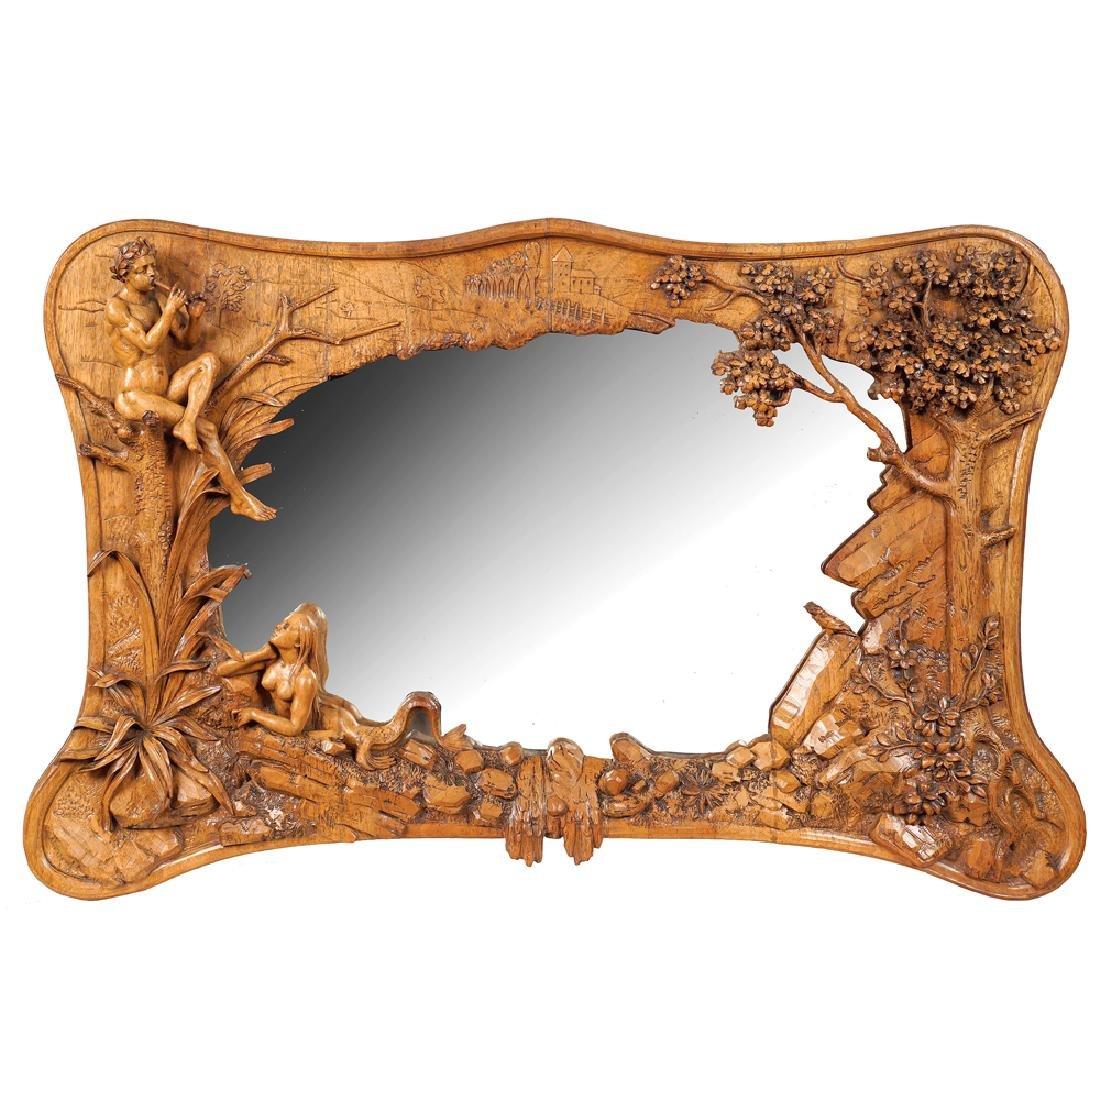 A lime wood wall mirror France 1900 50x85 cm.